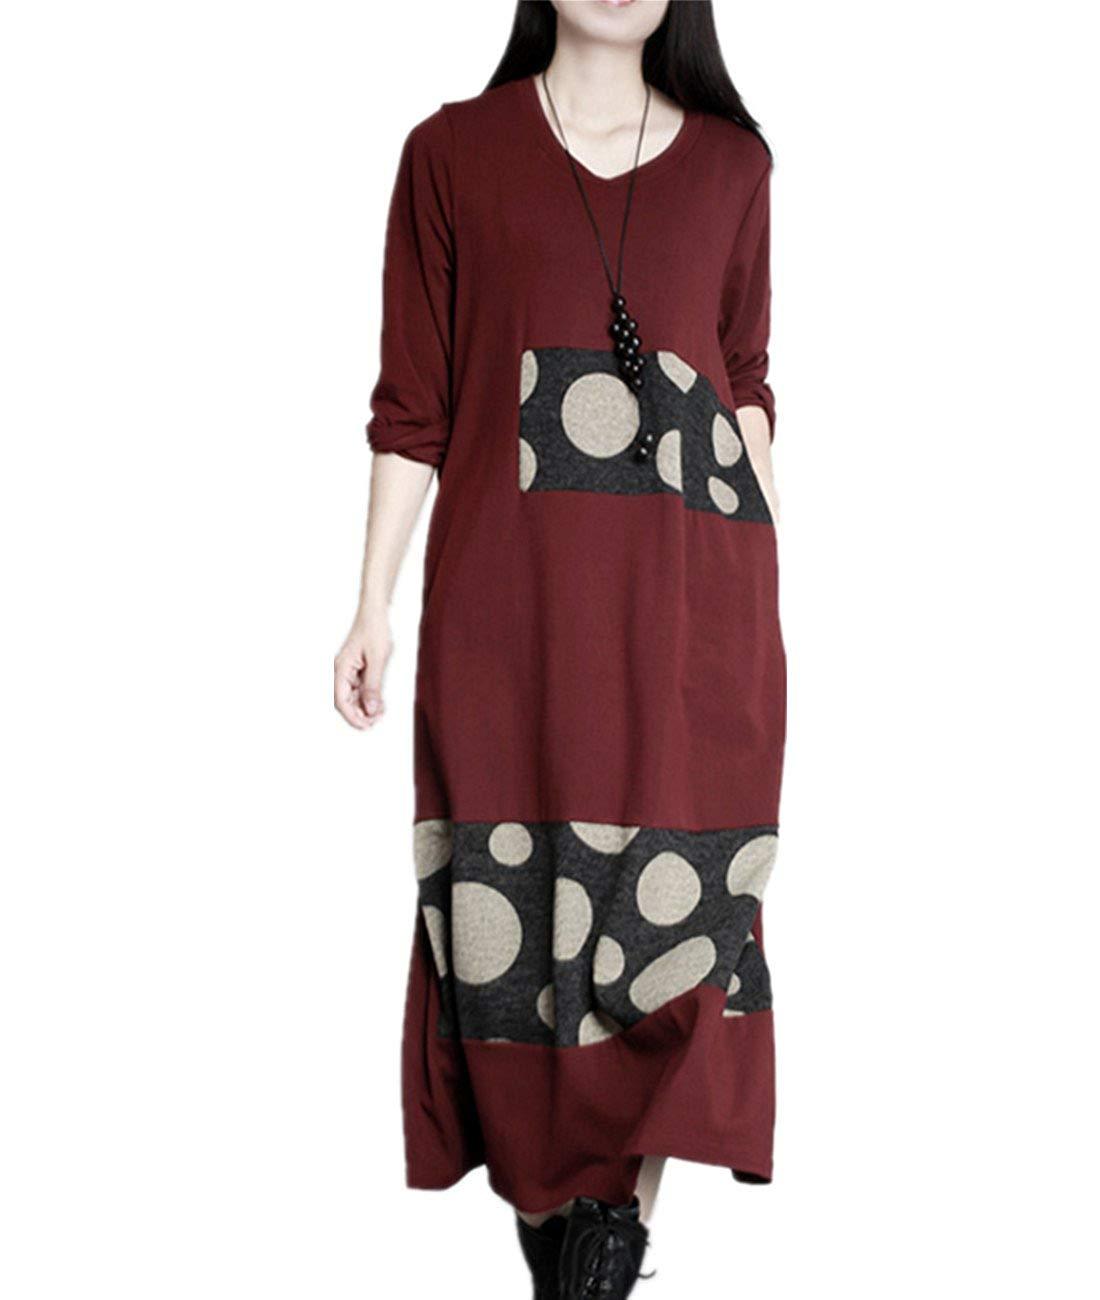 YESNO JT3 Women Flowy Tunic Dress Crew Neck Long Sleeve Knitted Dots Spliced/Pocket